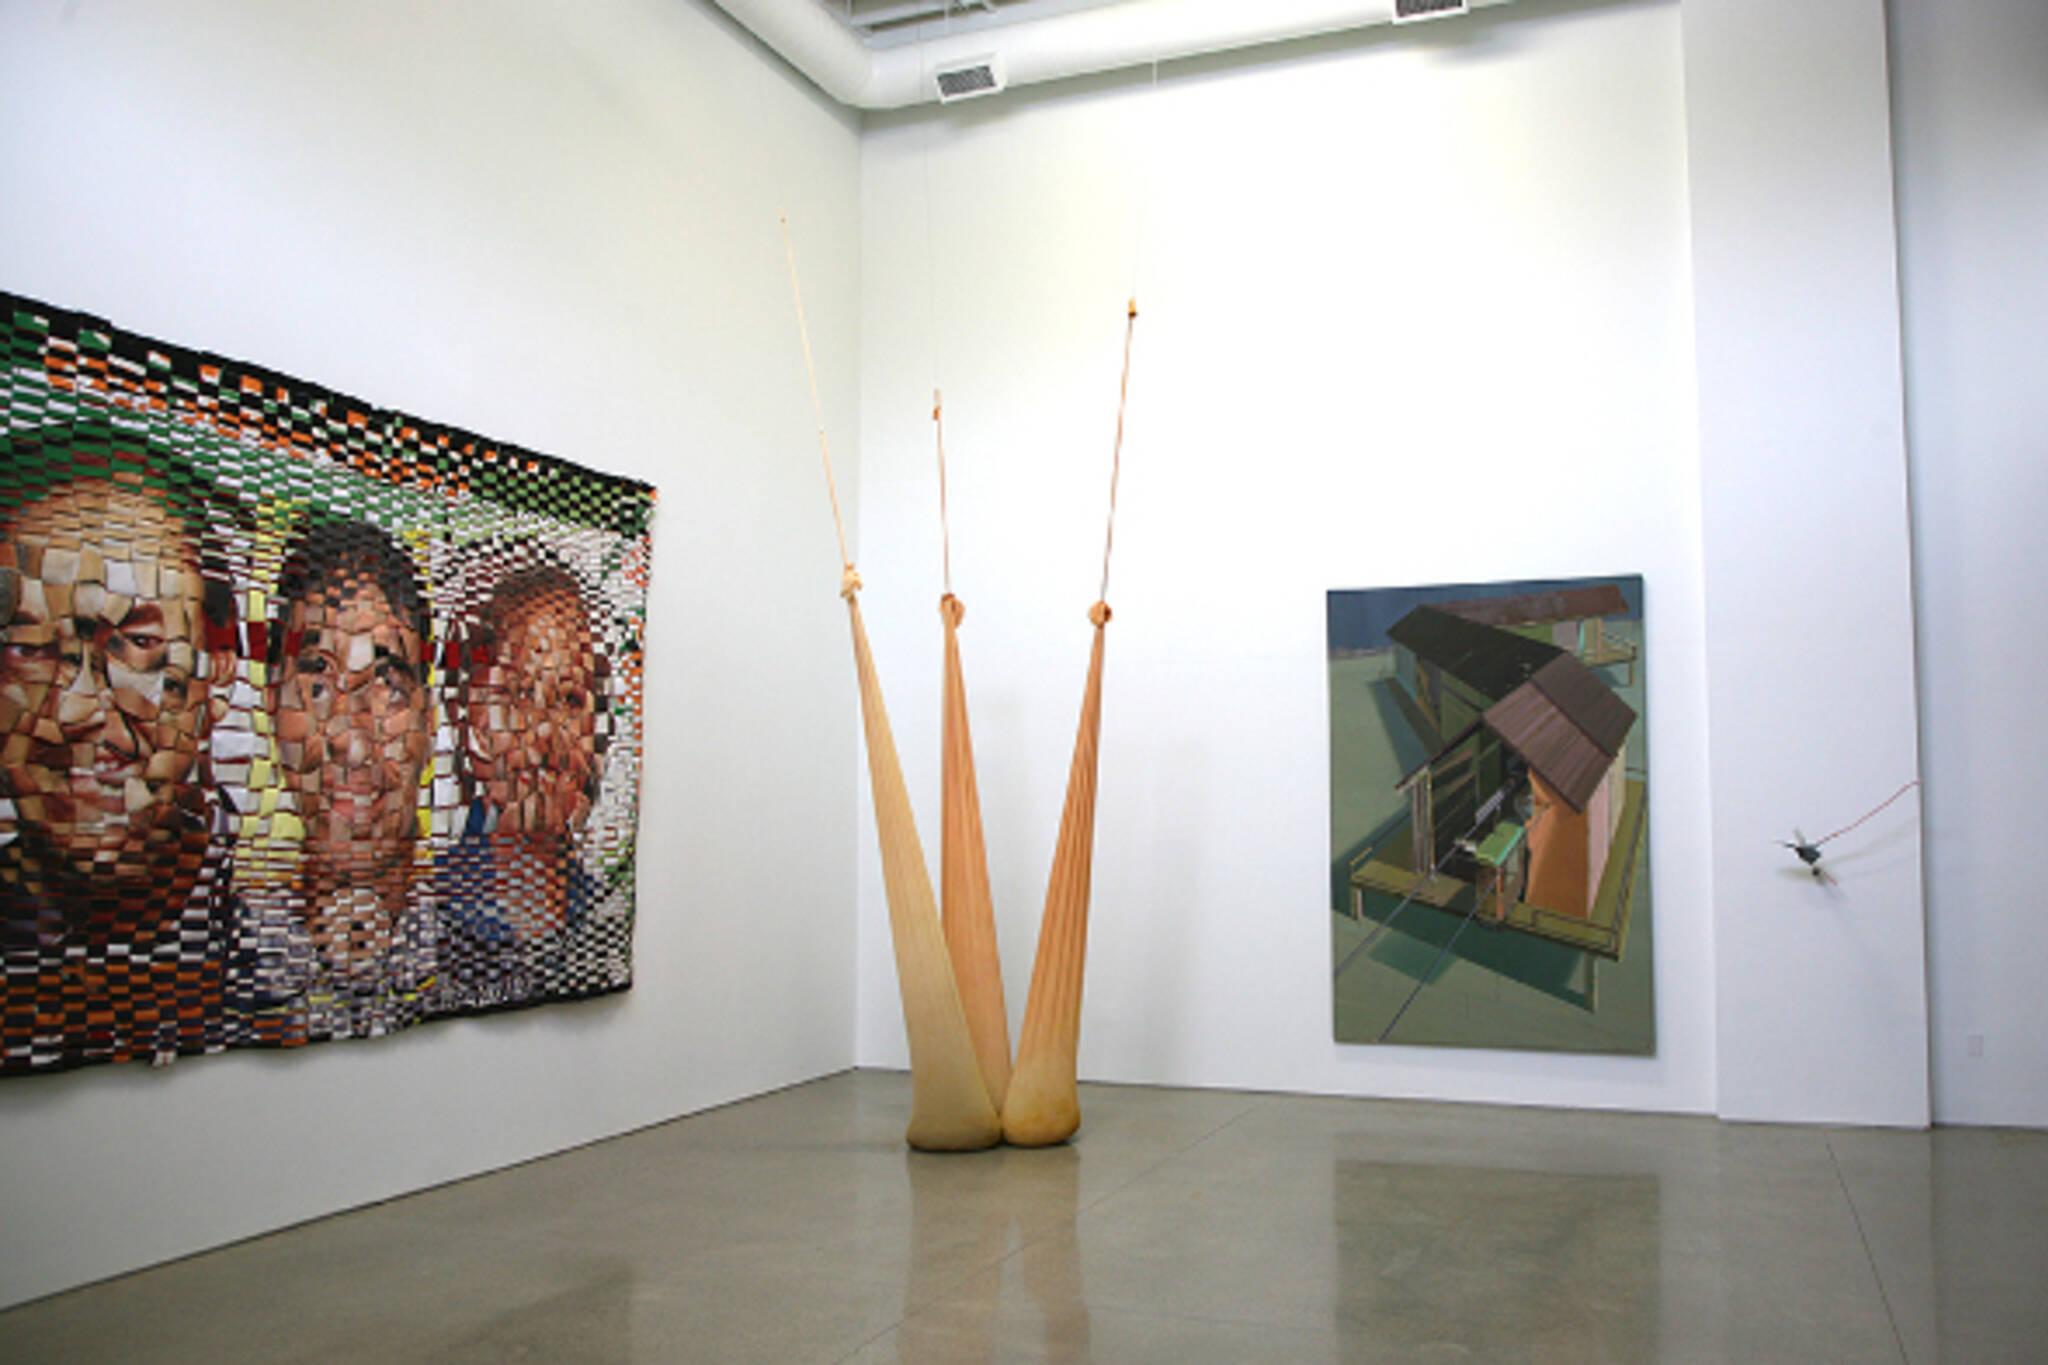 Alison Milne Gallery